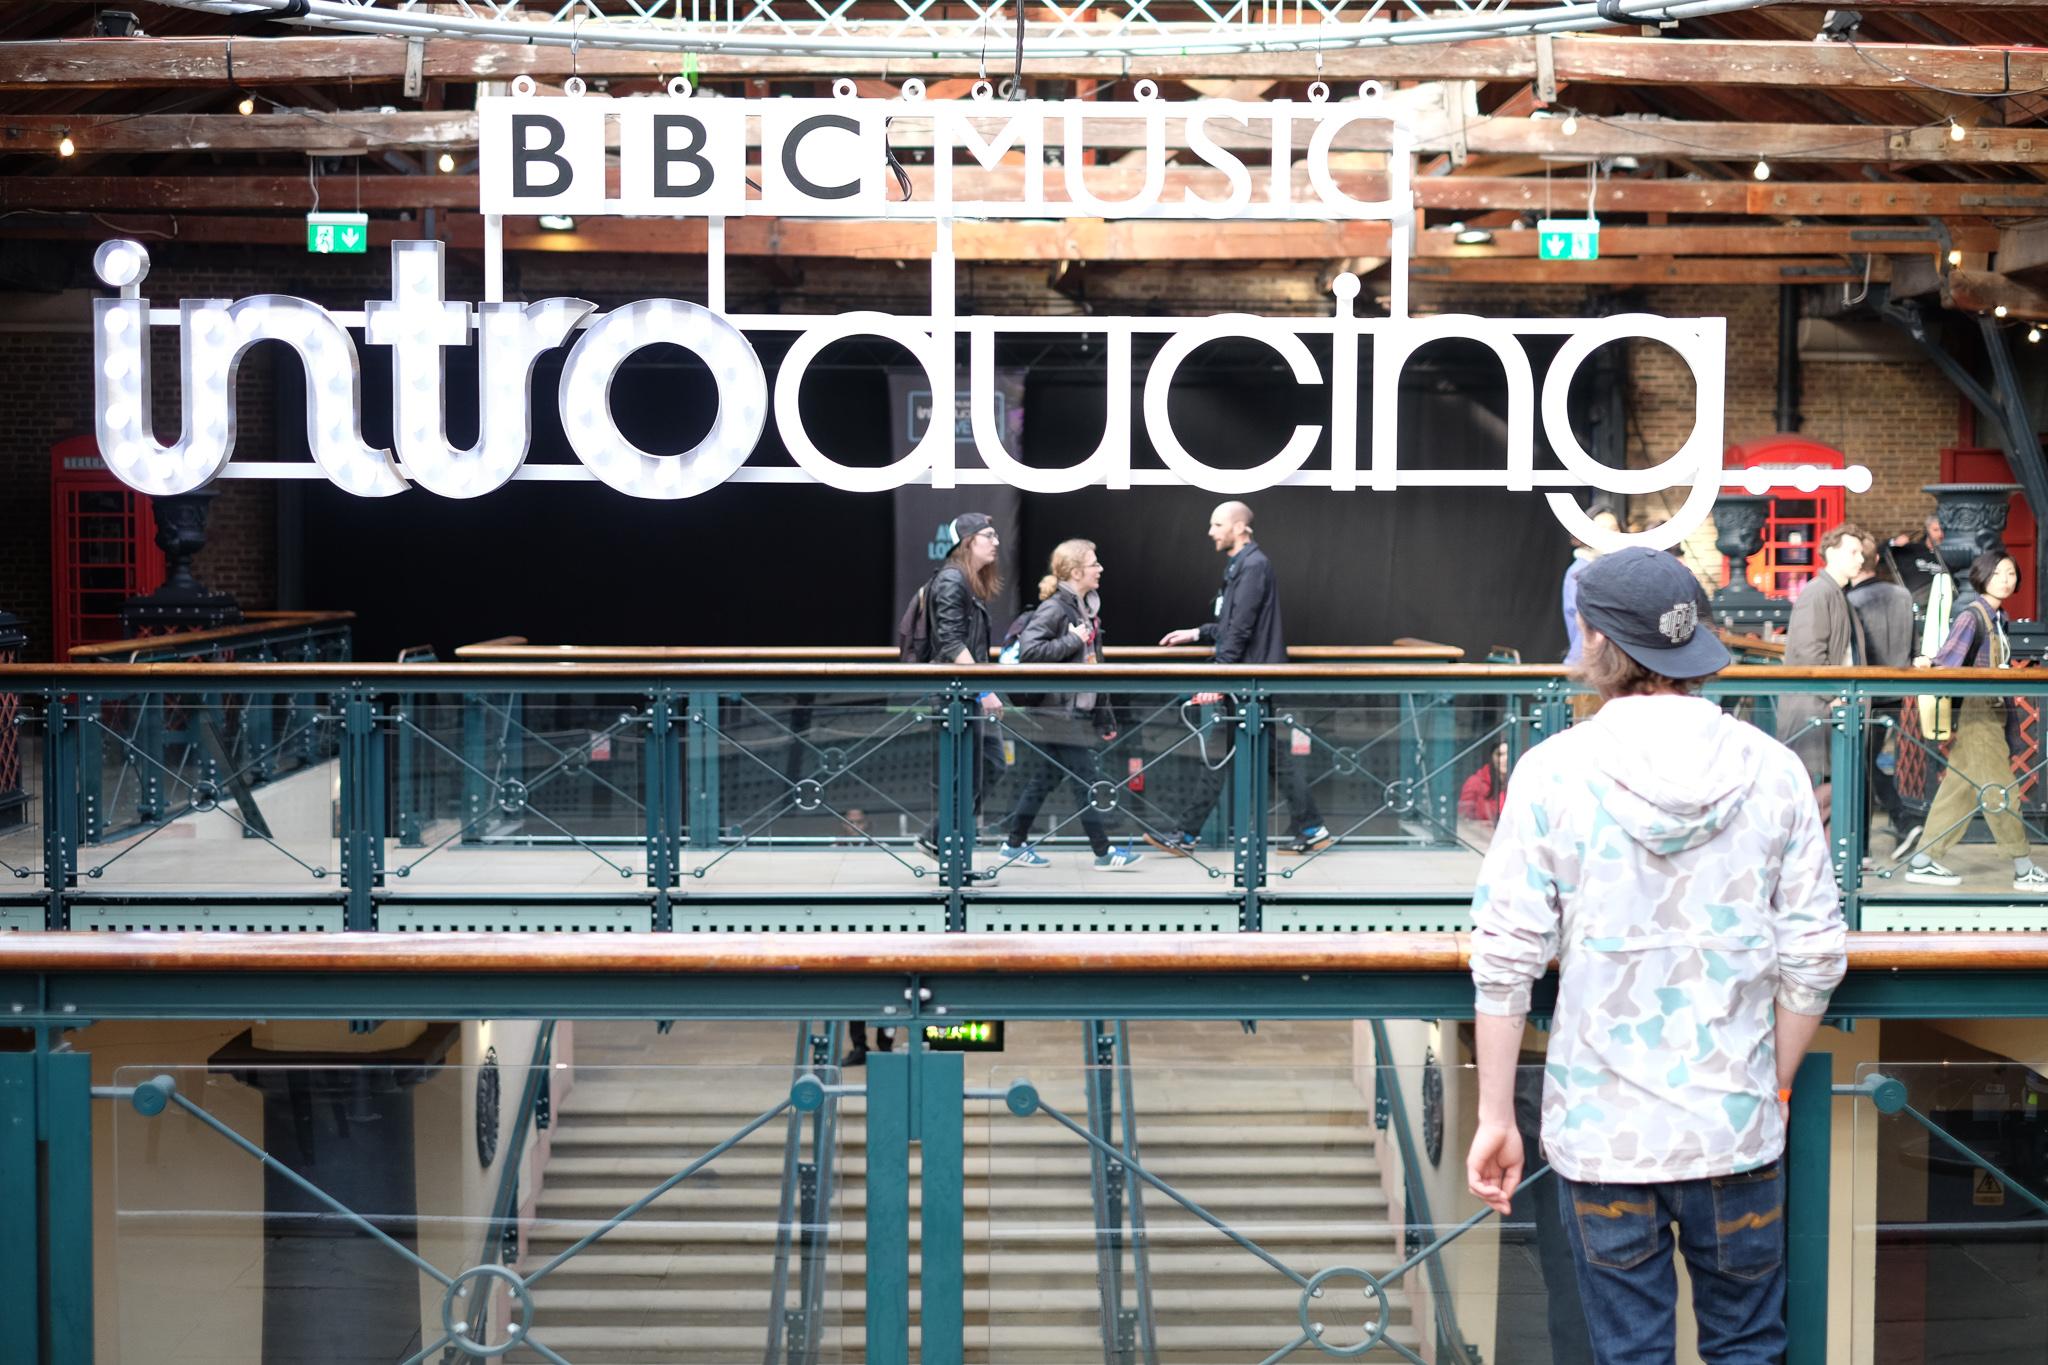 bbc introducing entrance